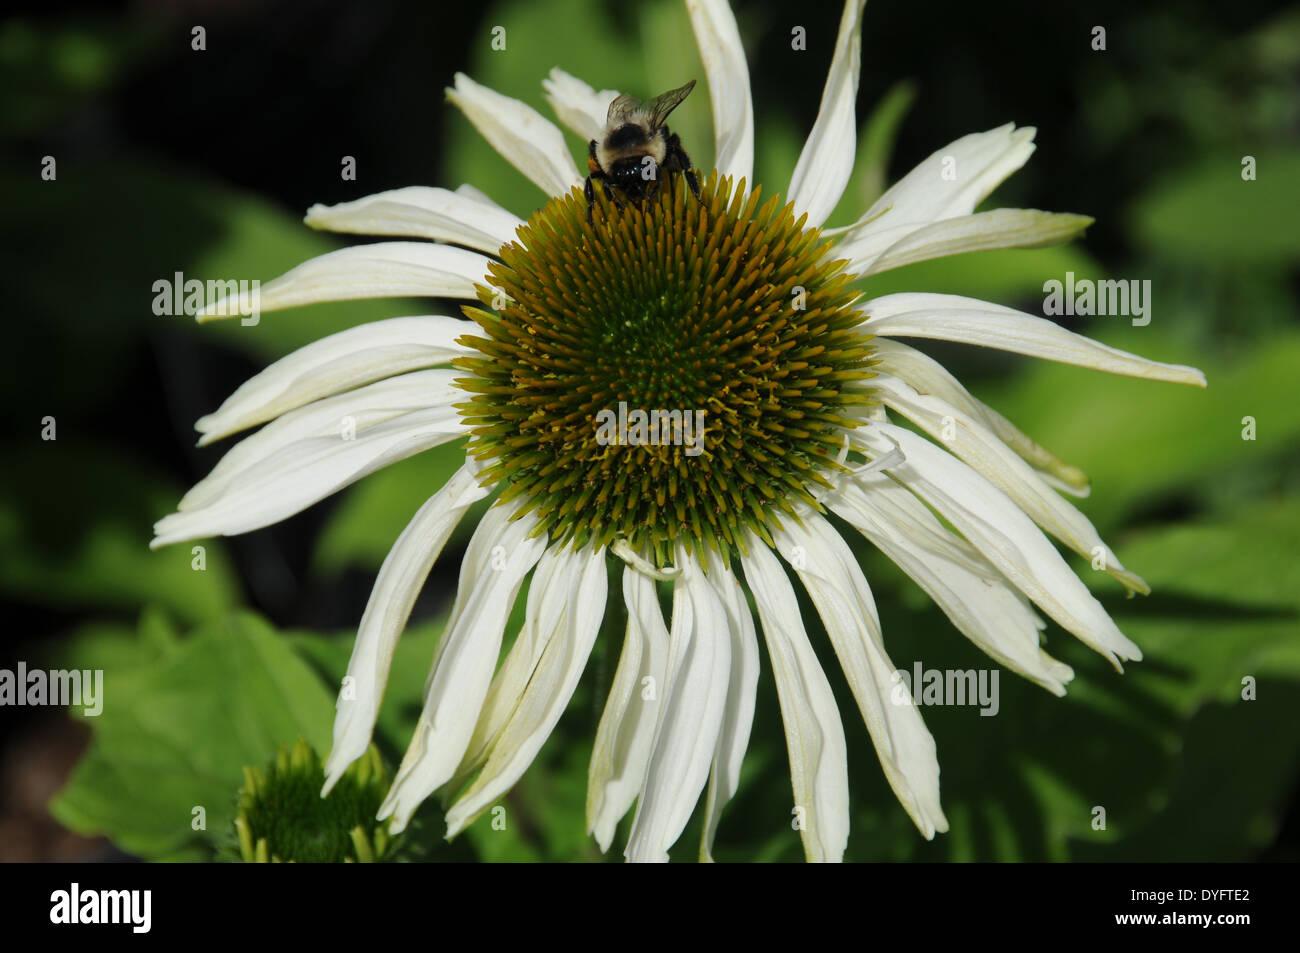 Echinacea Purple Cone Flower White Cone Flower Bees Stock Photo